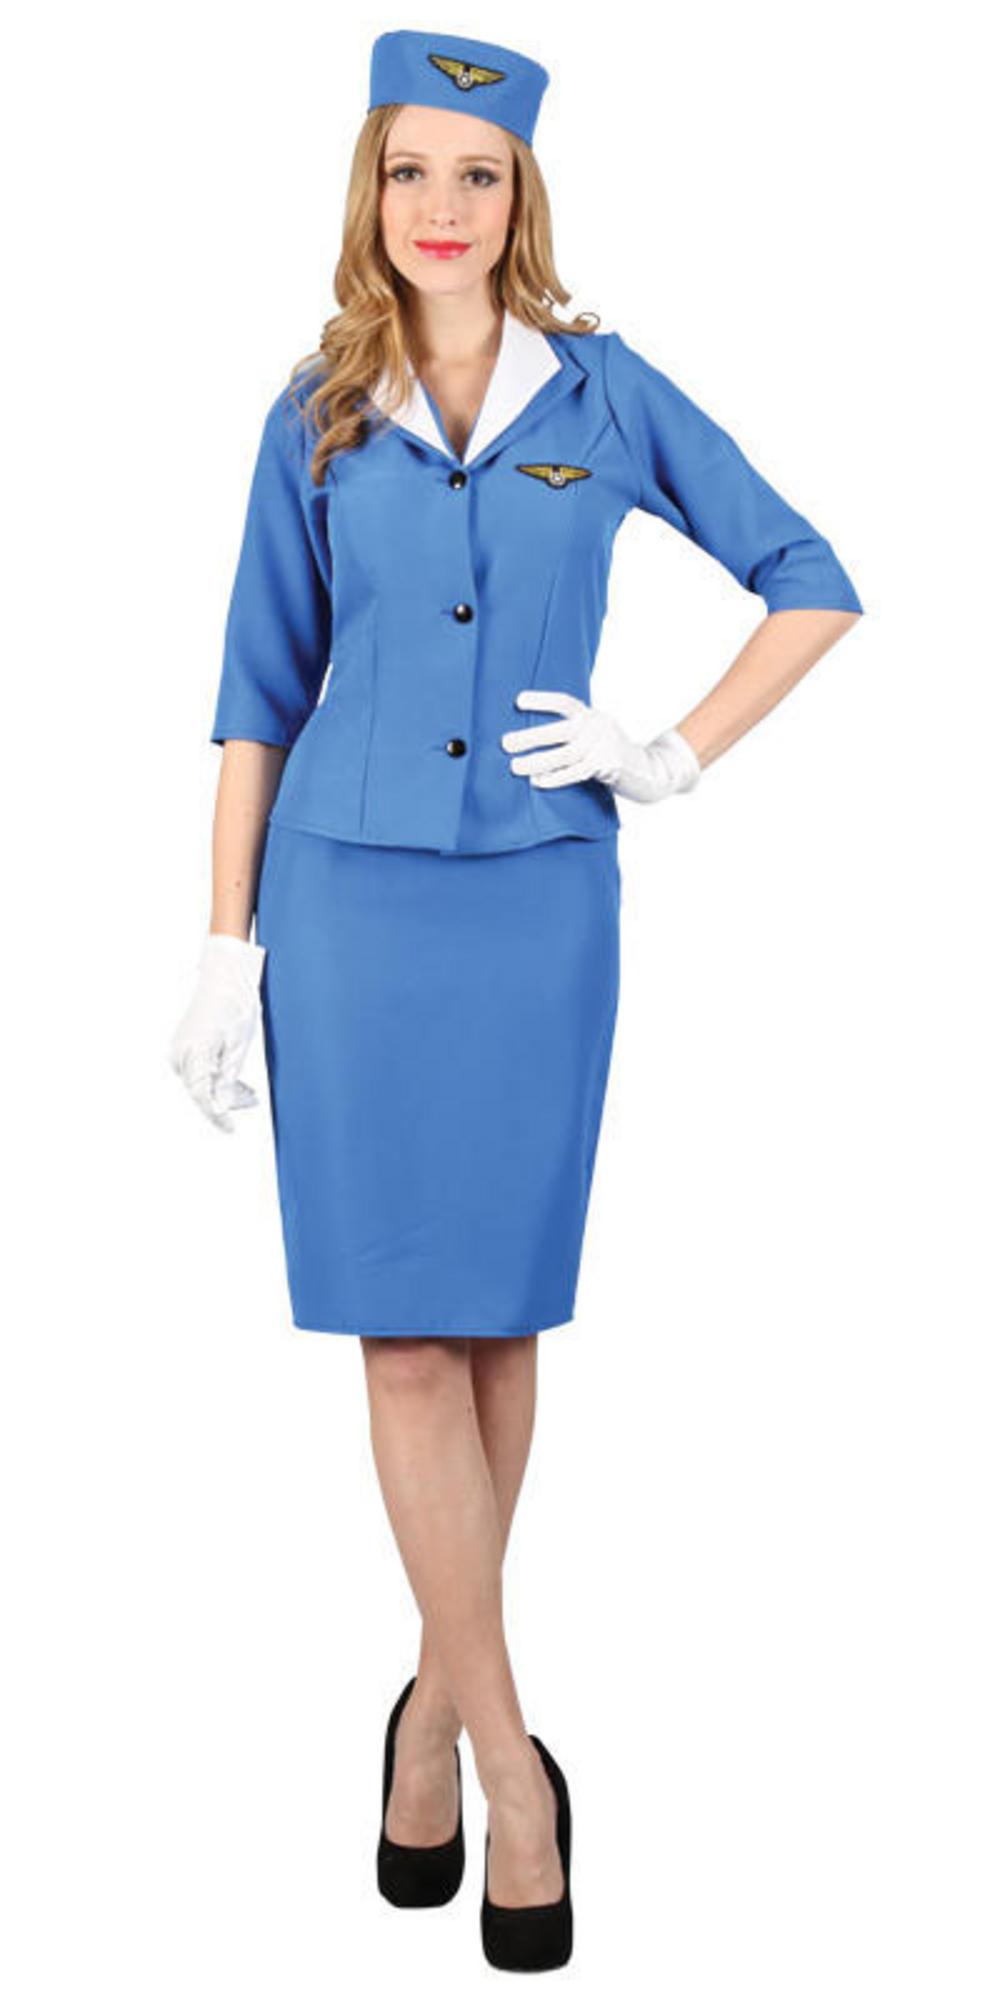 Pan-Am Hostess Costume